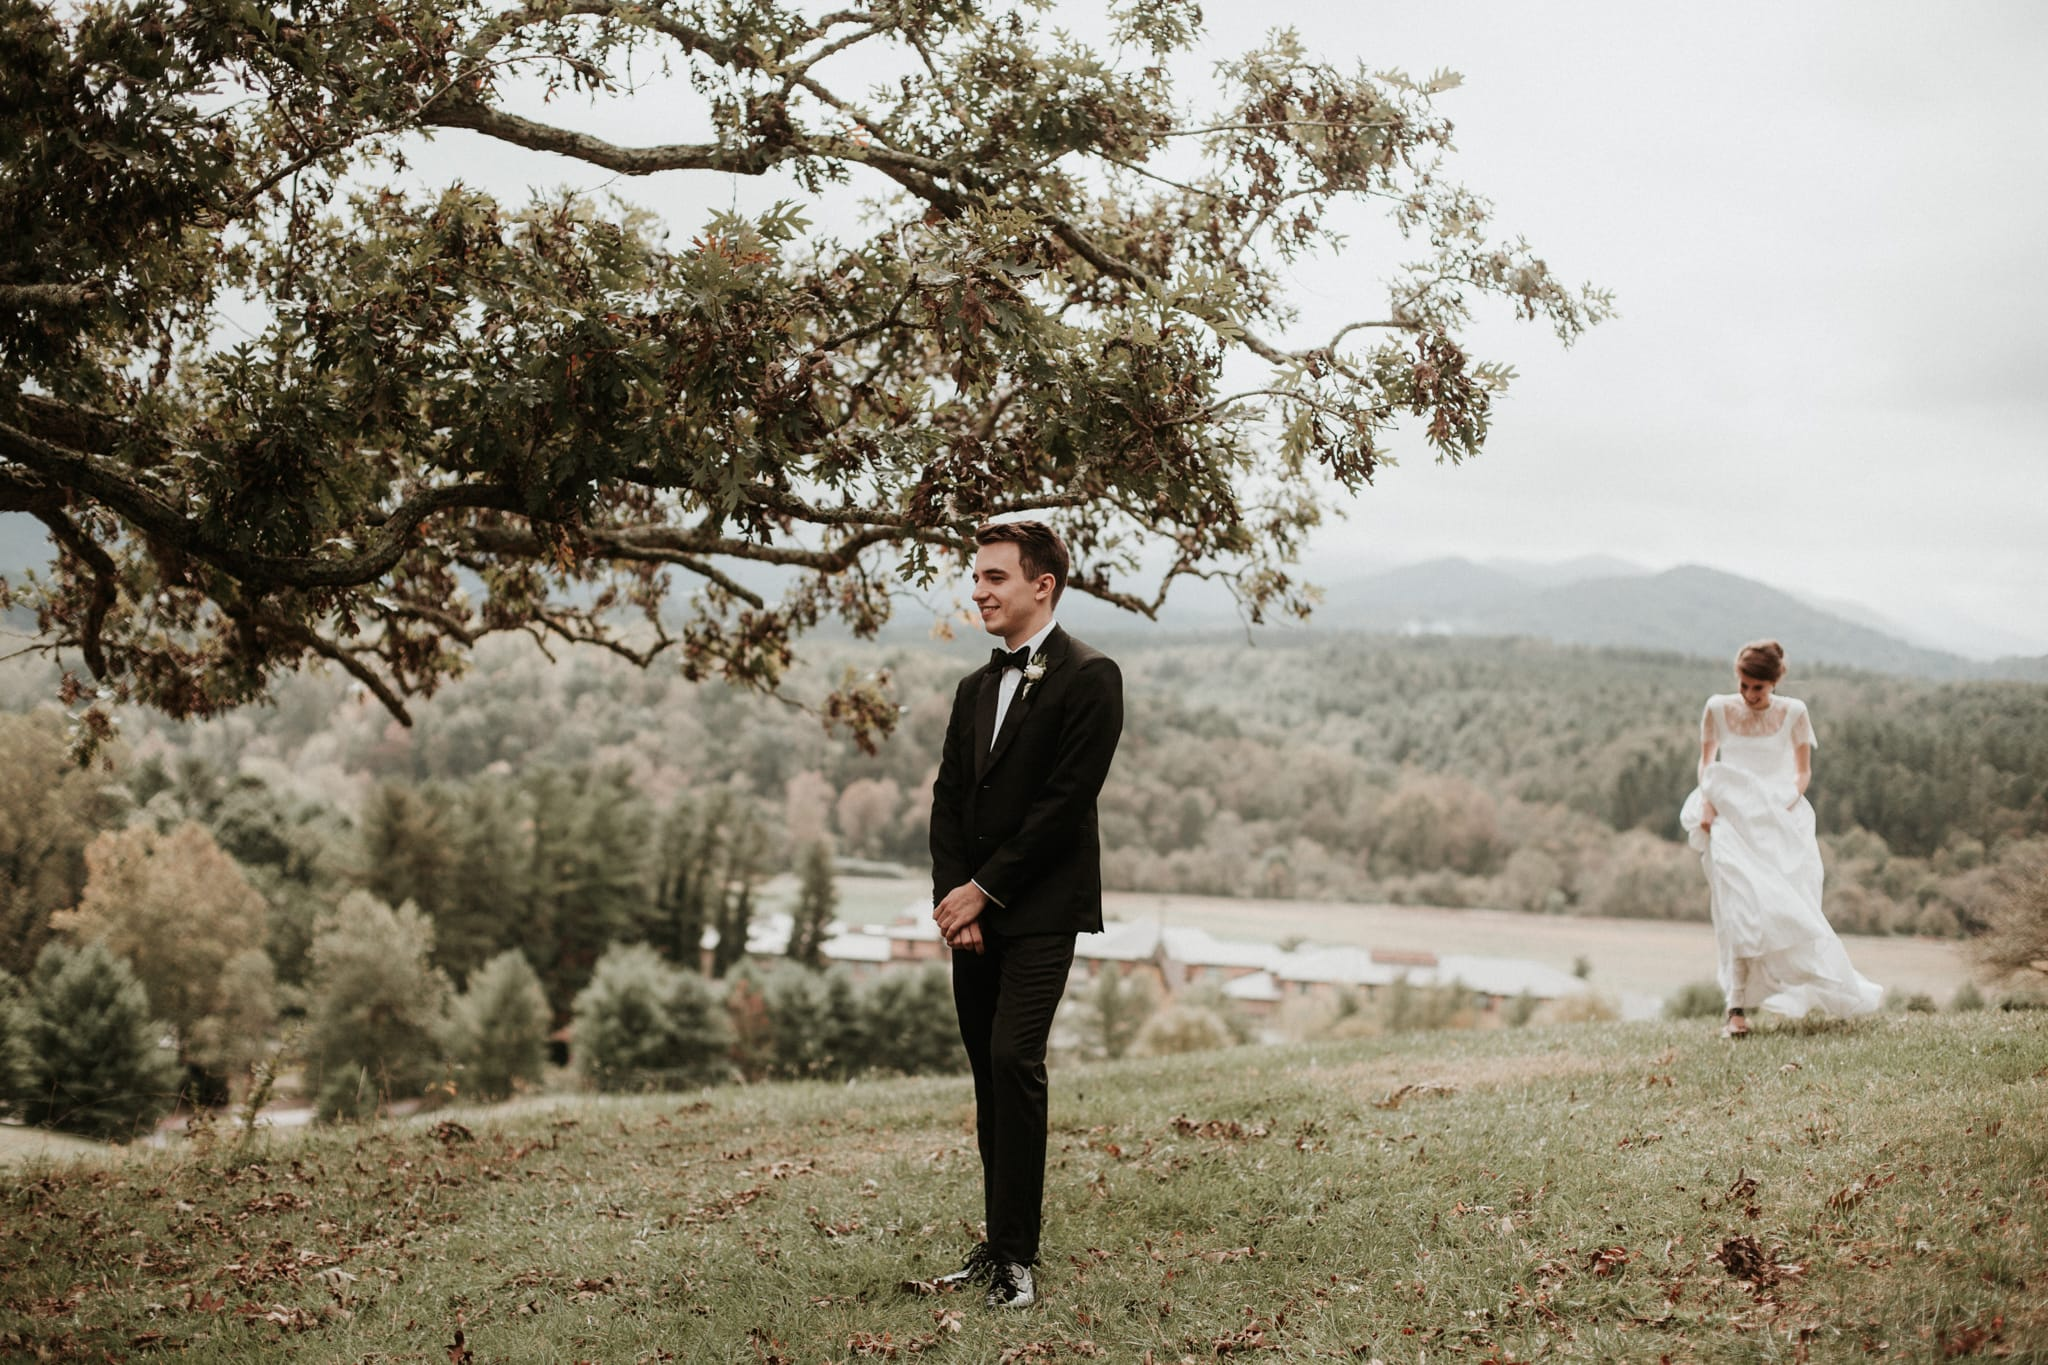 Biltmore-wedding-photographer-asheville-nc-1.jpg